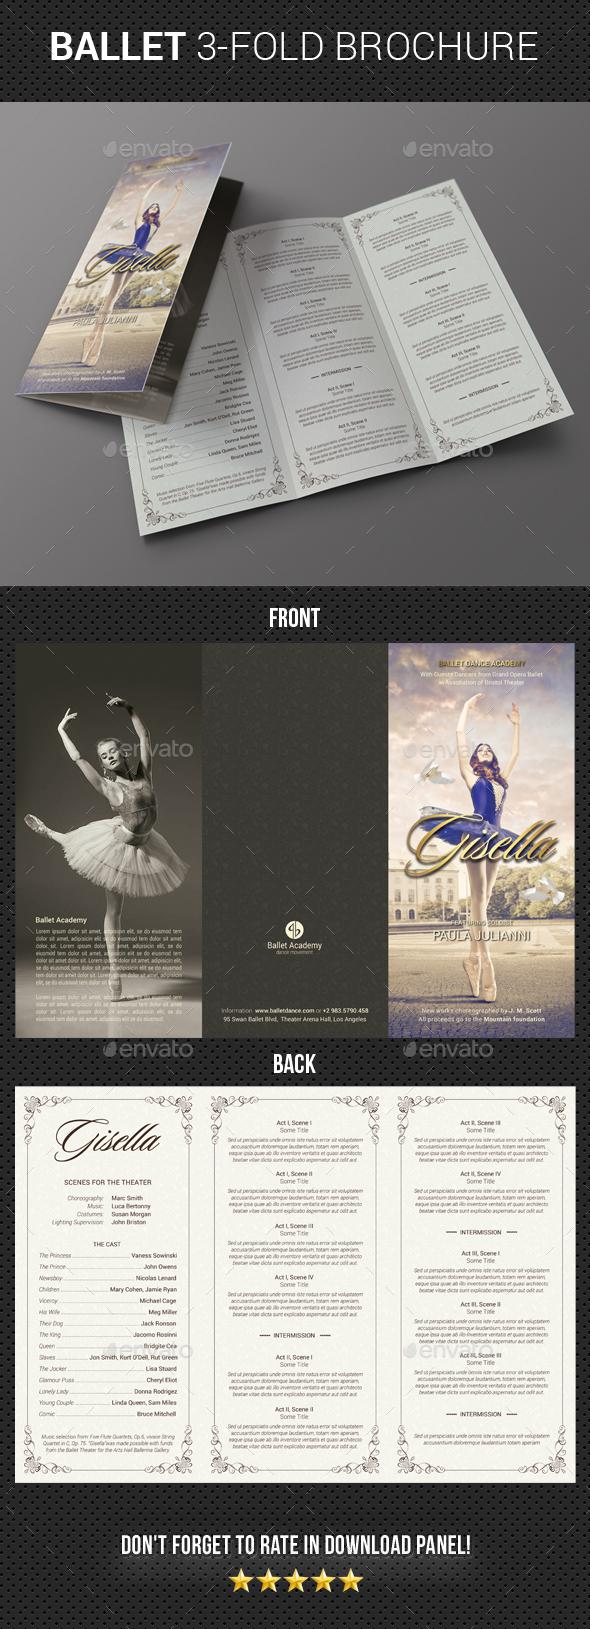 Ballet Program 3-Fold Brochure - Brochures Print Templates